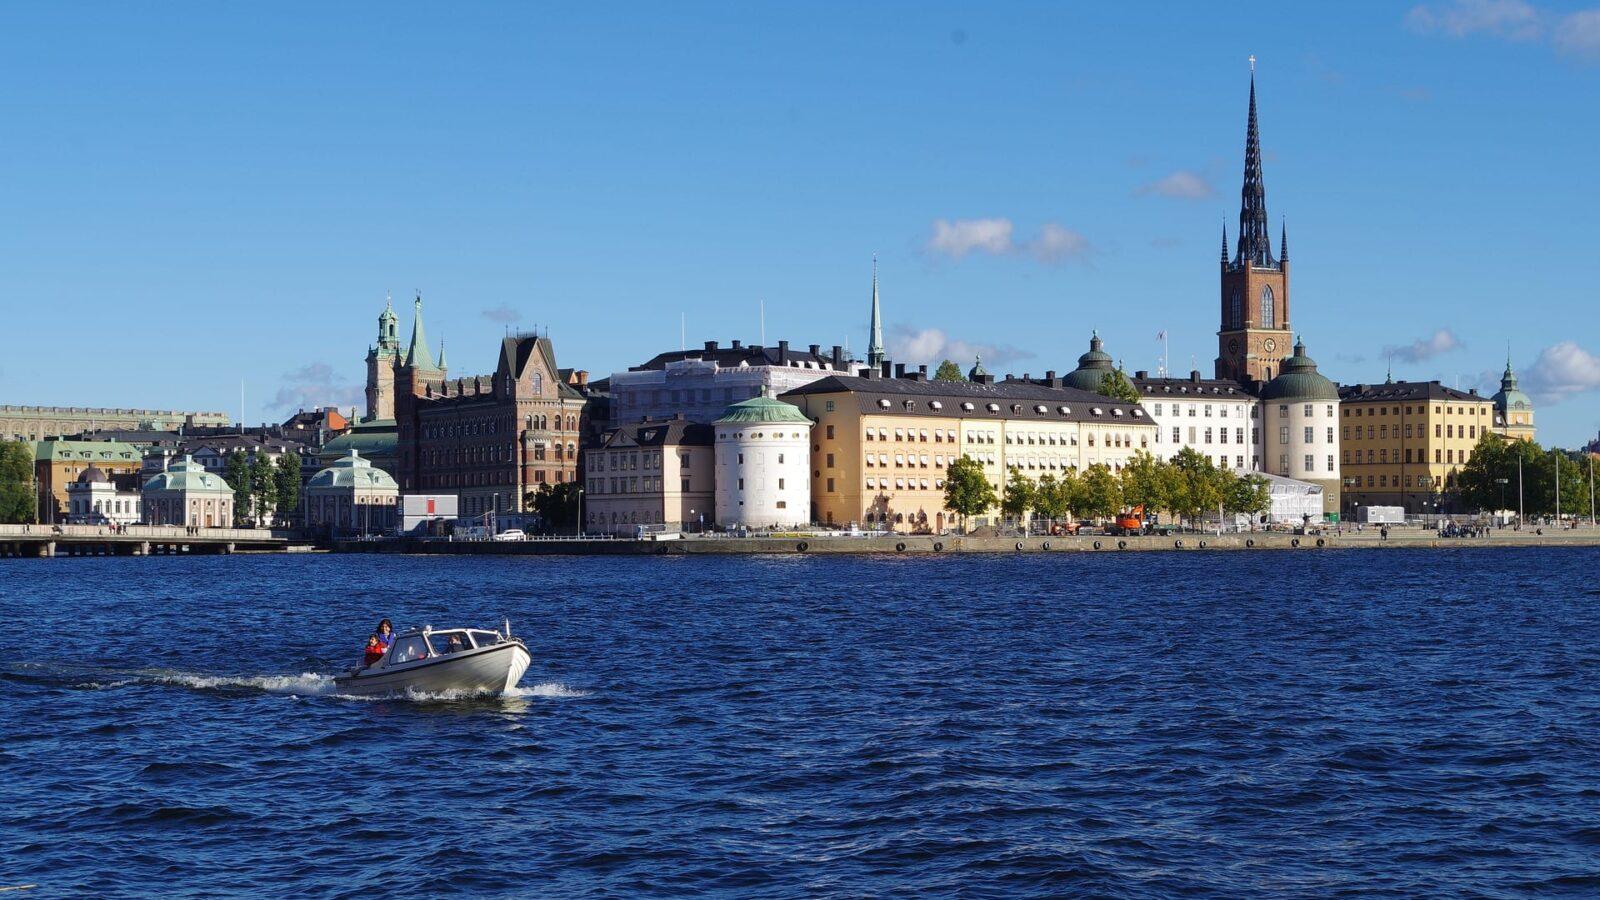 Kulturelle Vielfalt in Schweden (inkl. Gewinnspiel)